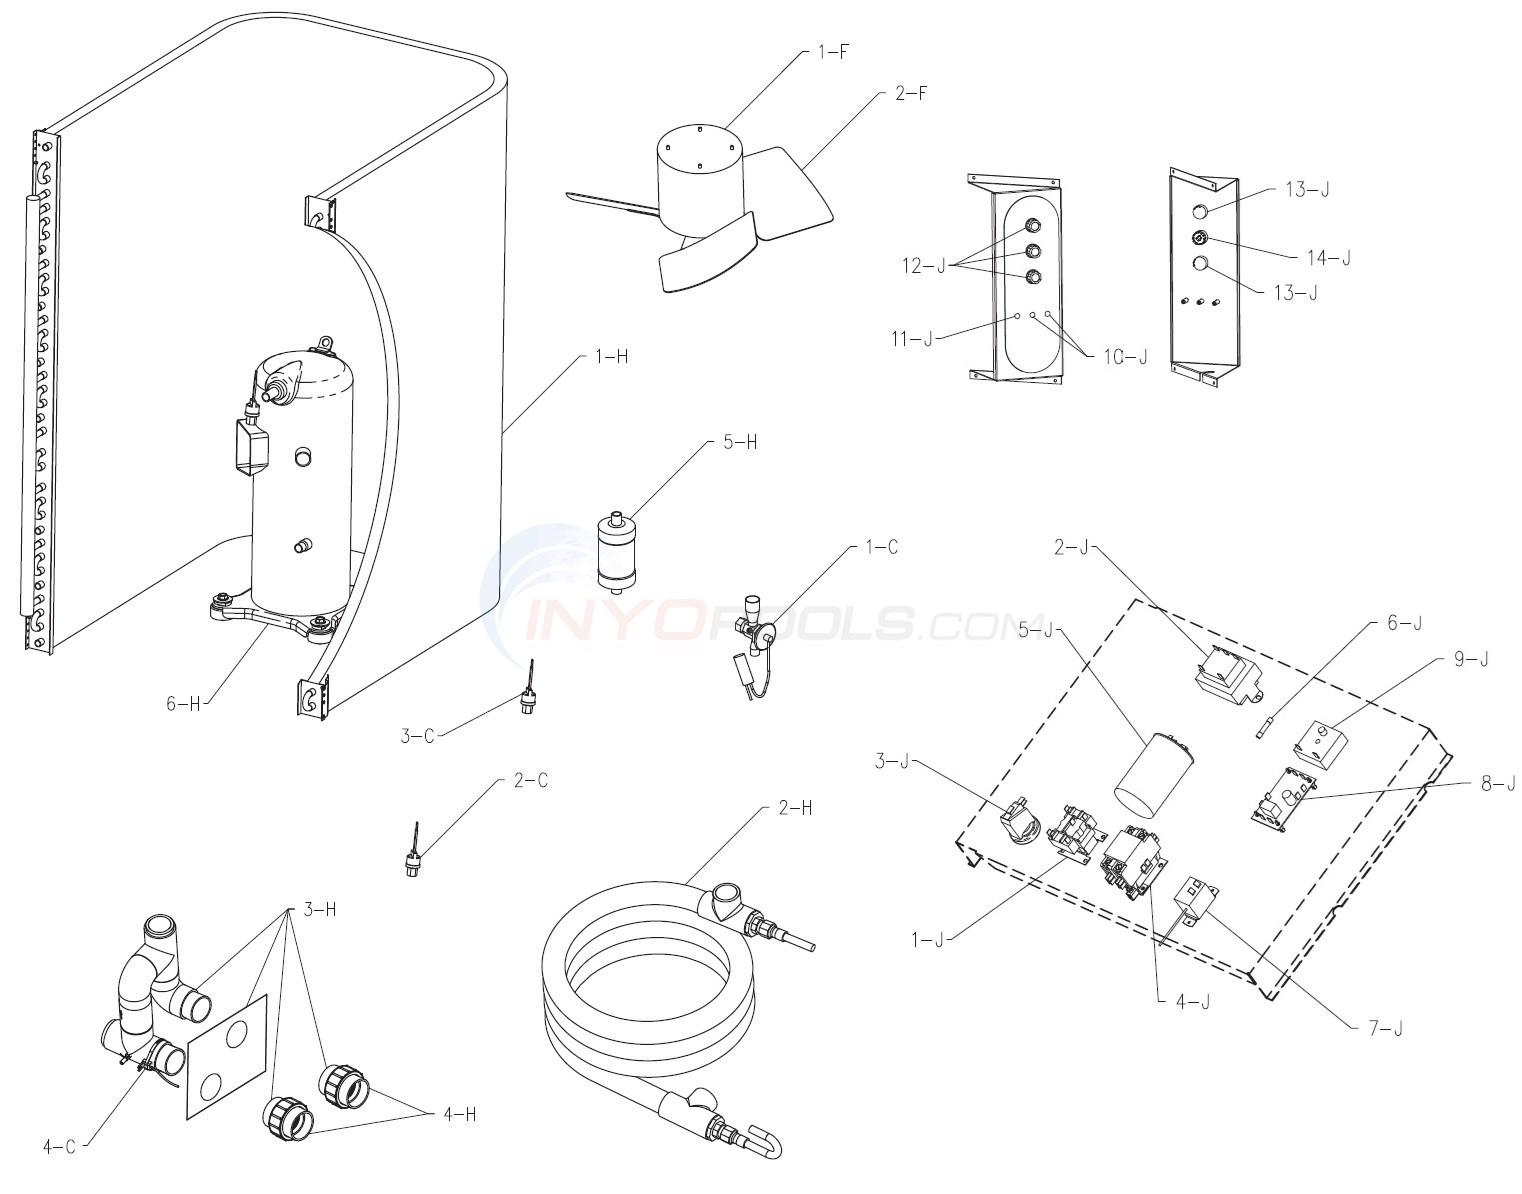 Taskmaster 5100 heater wiring diagram 3 phase heater wiring diagram raypak heat pump 5100 2 taskmaster